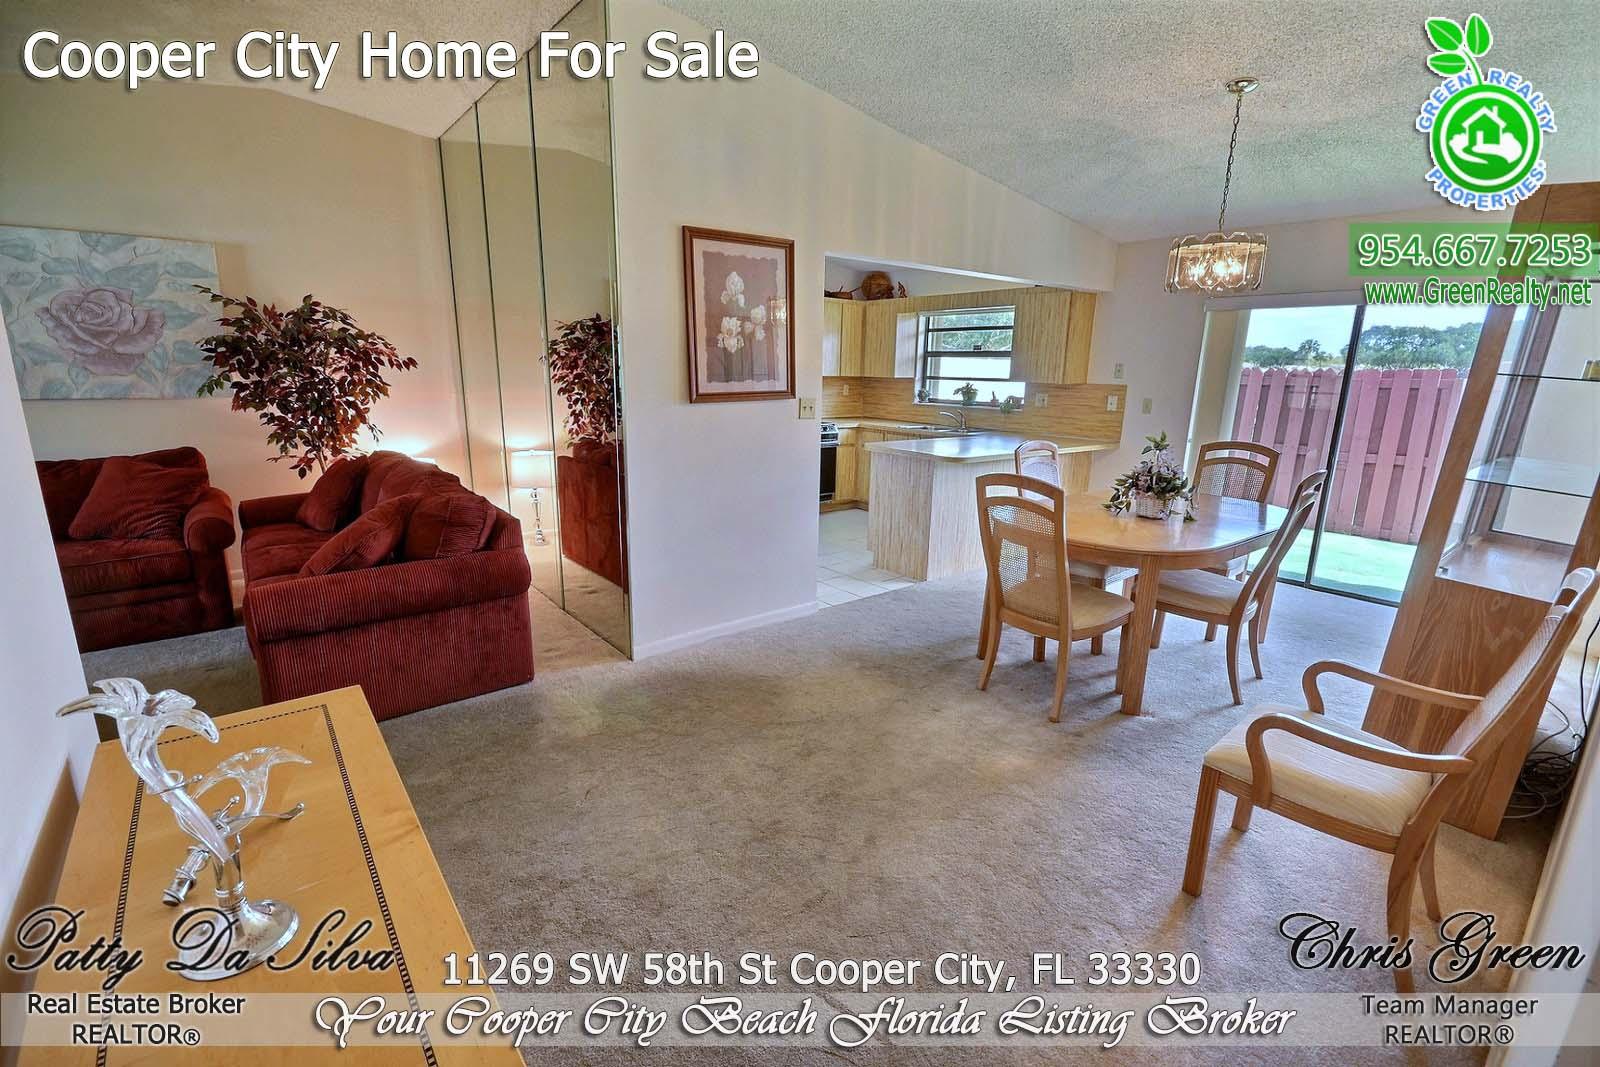 7 Cooper City Real Estate - Villas (12)